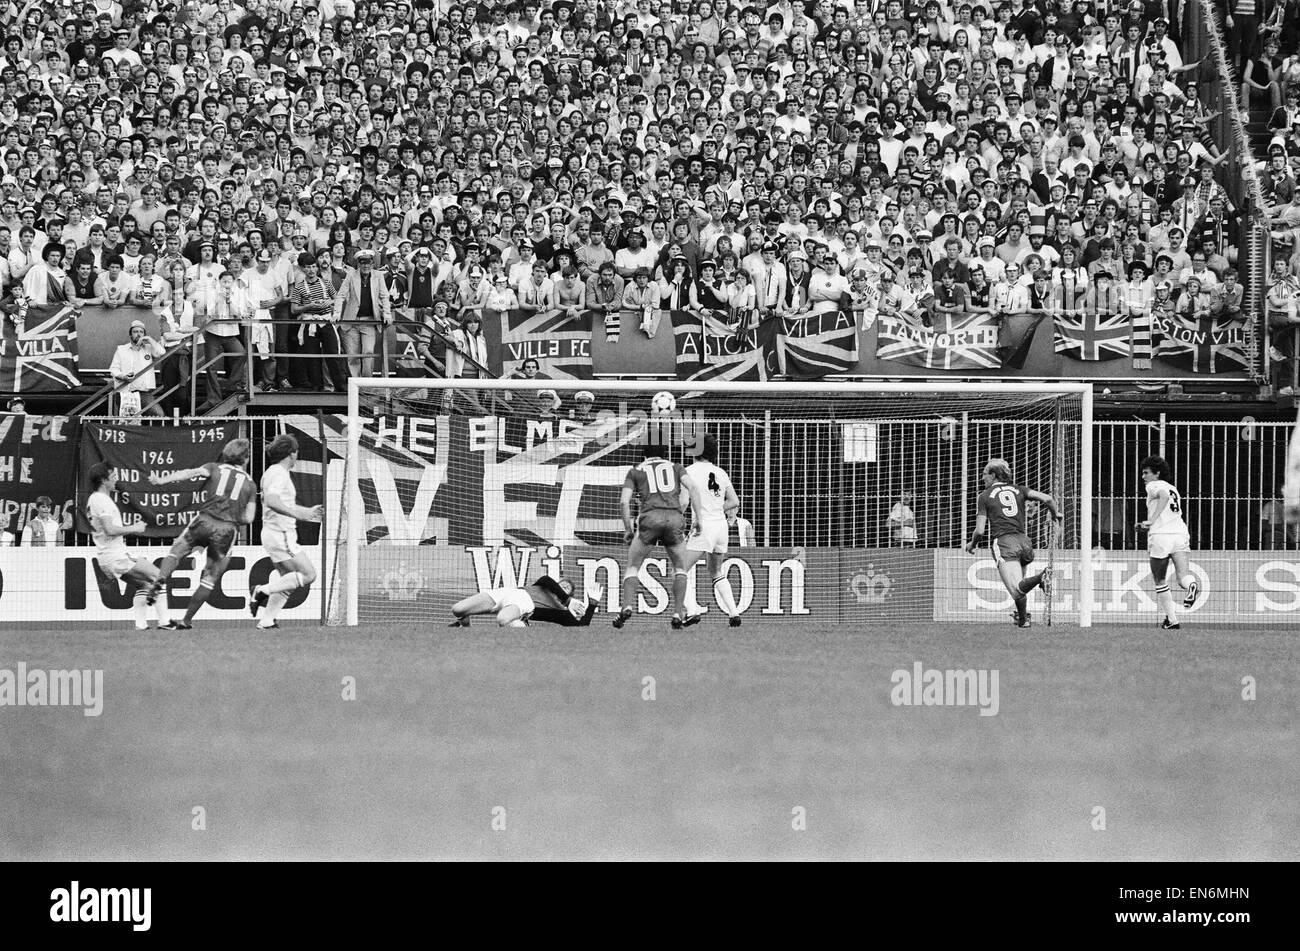 Johnny MacLeod Aston Villa FC footballer 1967 Stock Photo, Royalty ...